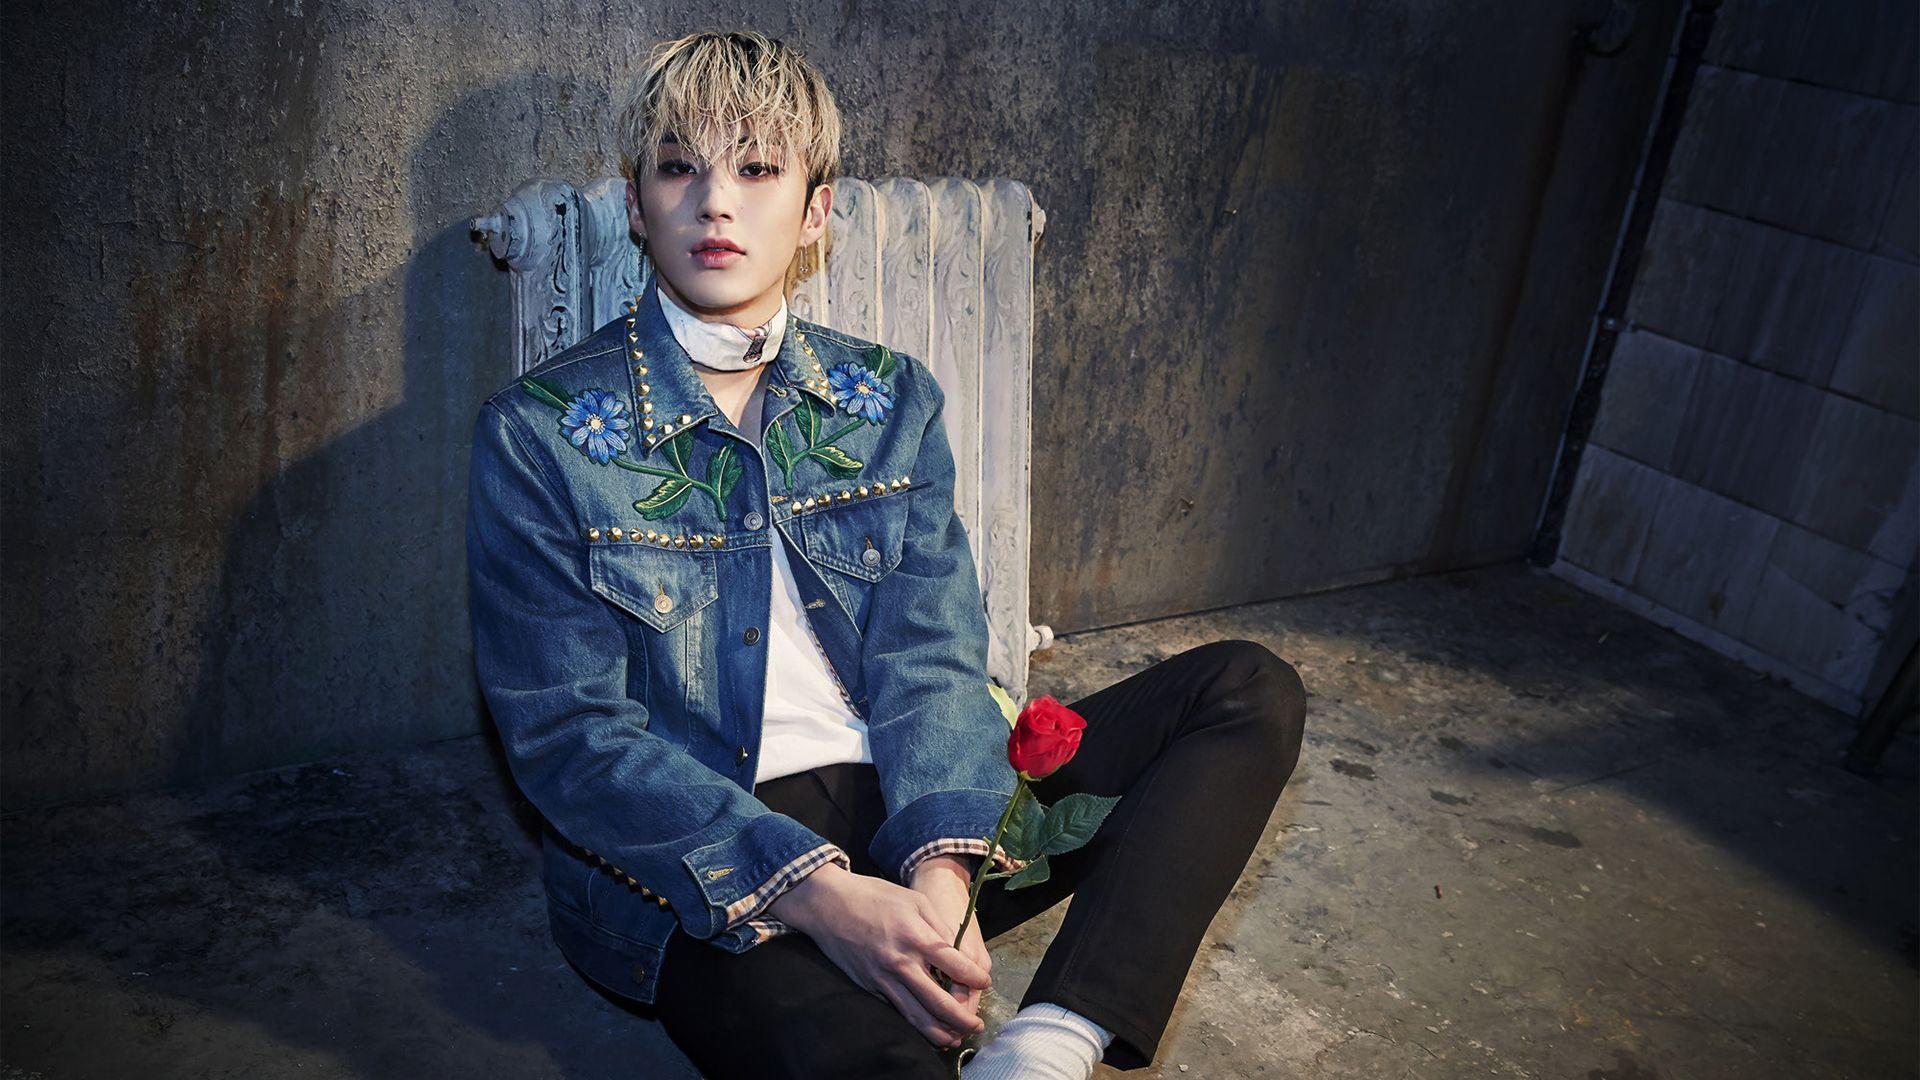 Desktop Wallpaper / B.A.P 비에이피 MoonJongup 문종업 Jongup 종업 | Wallpaper K-POP Boys Full HD ...